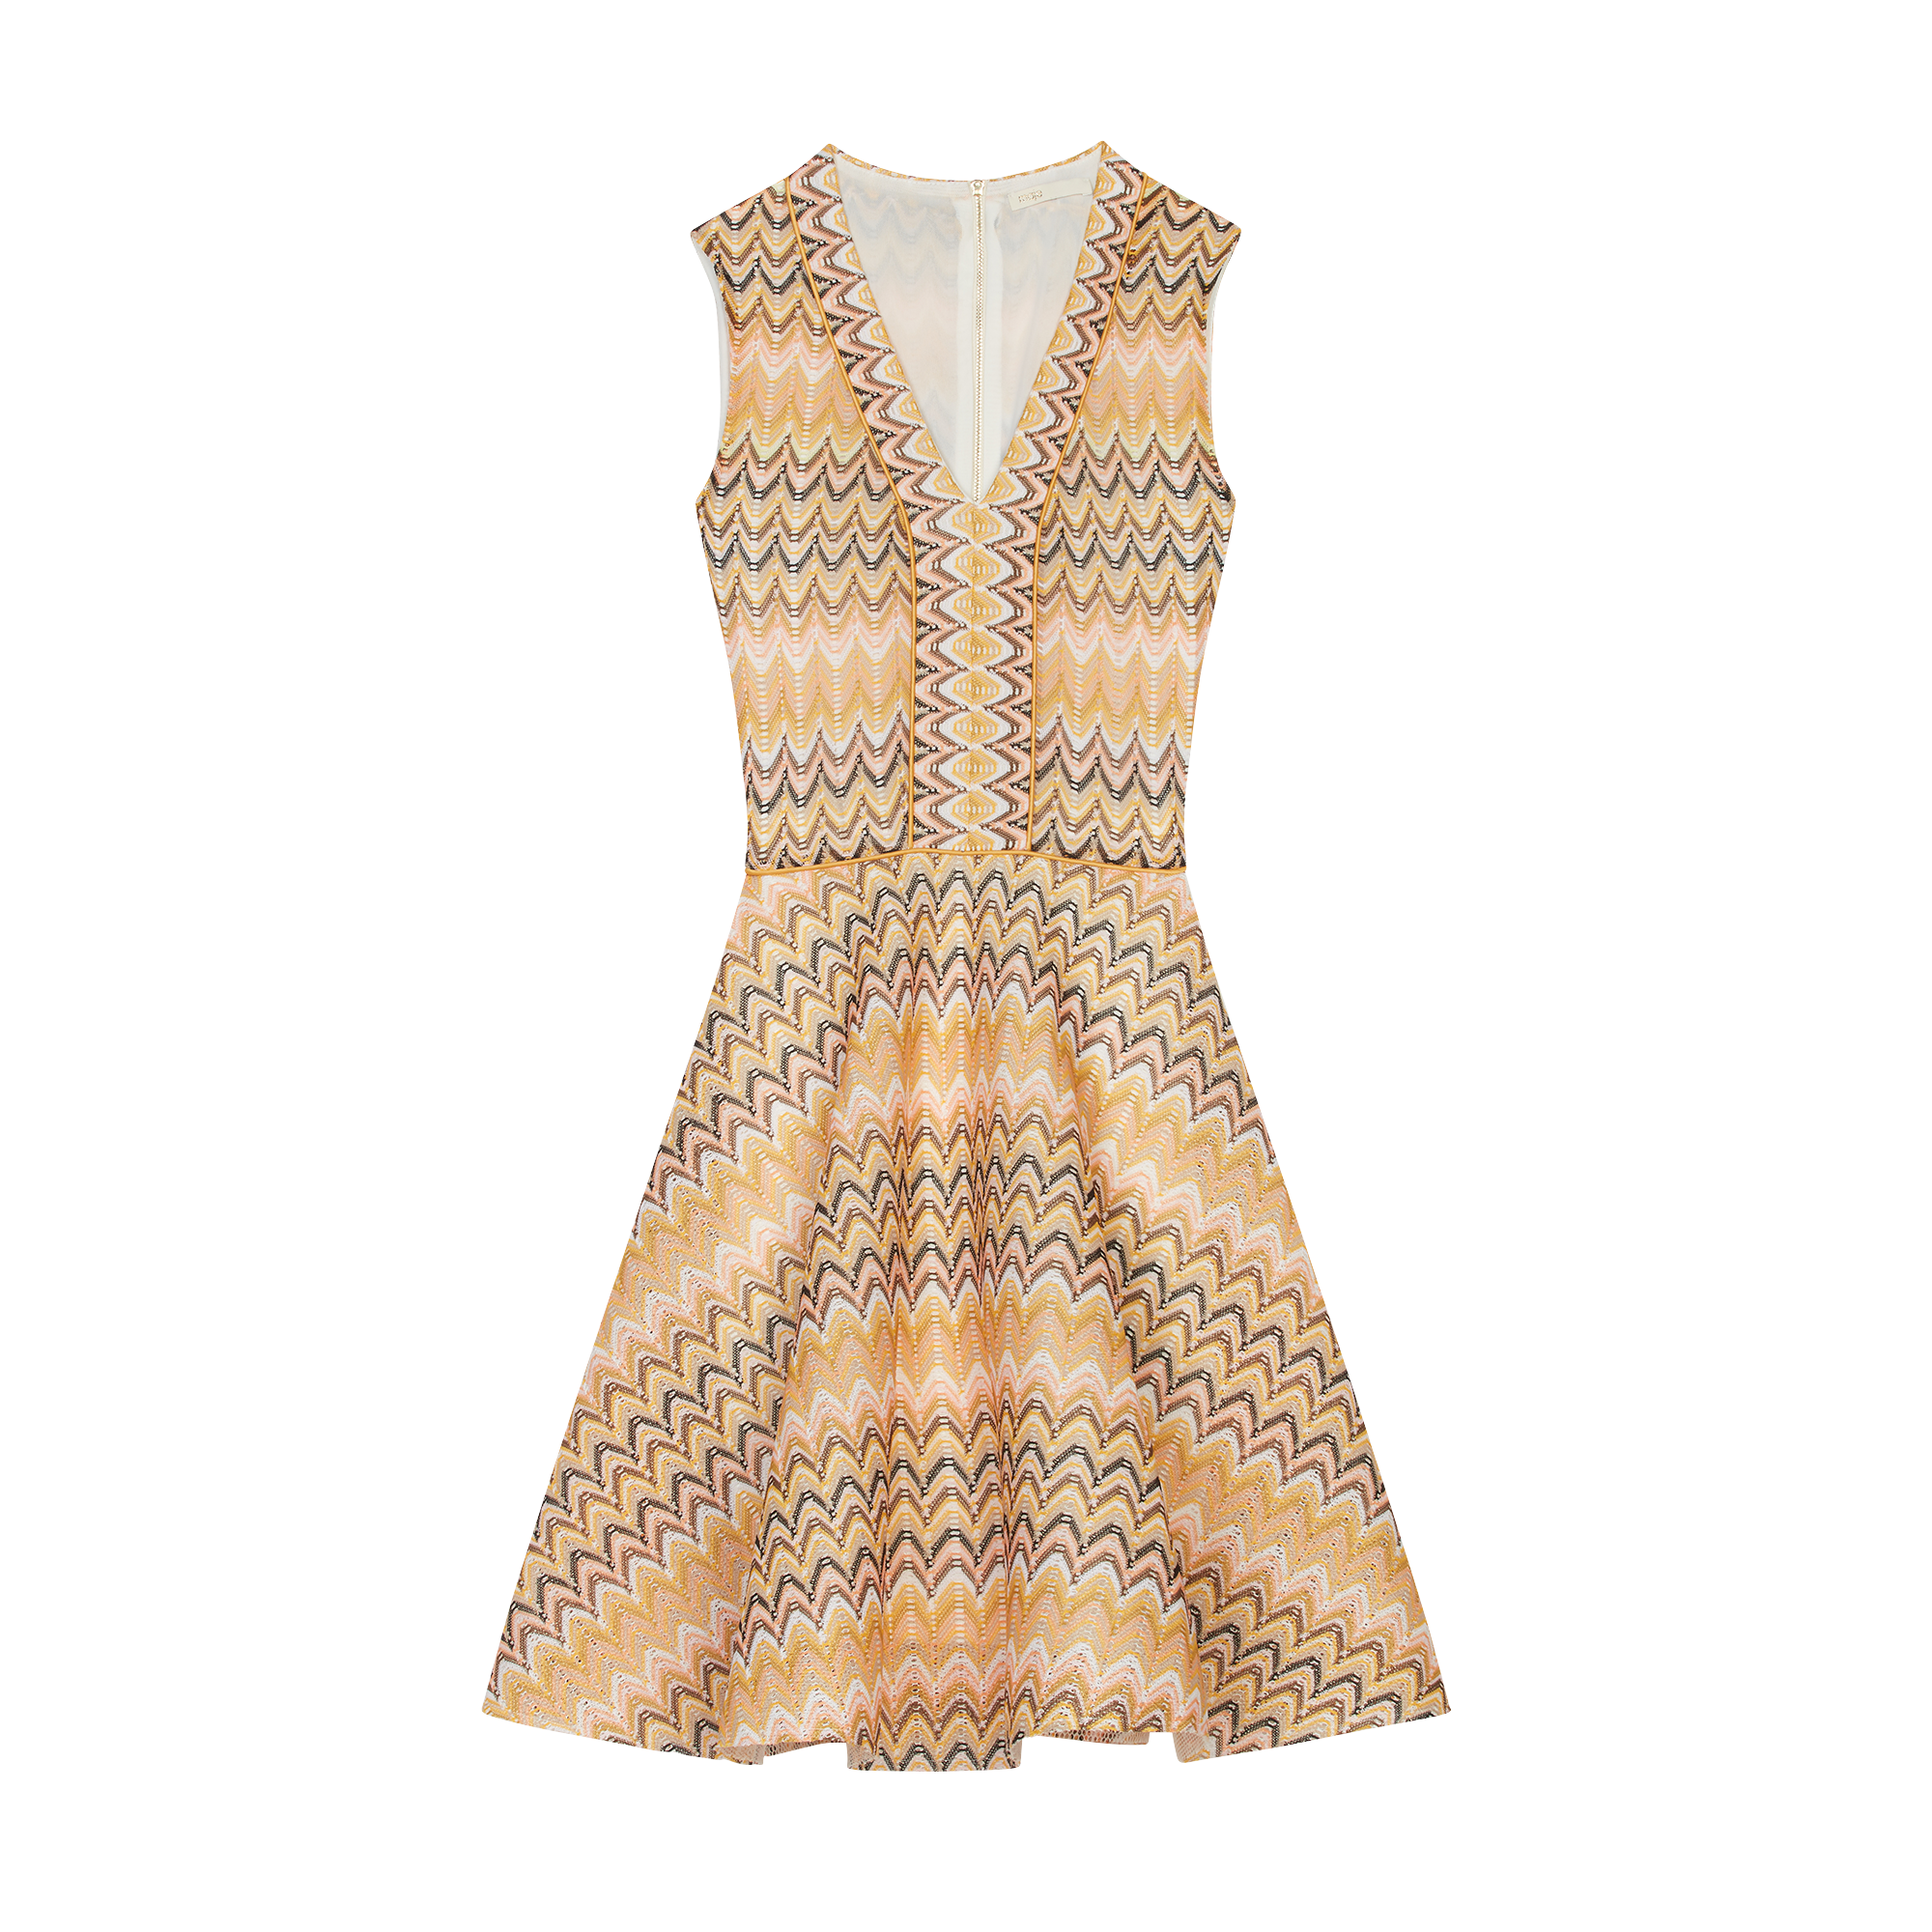 c6ef198461b9 Striped knit skater dress - The Essentials - MAJE